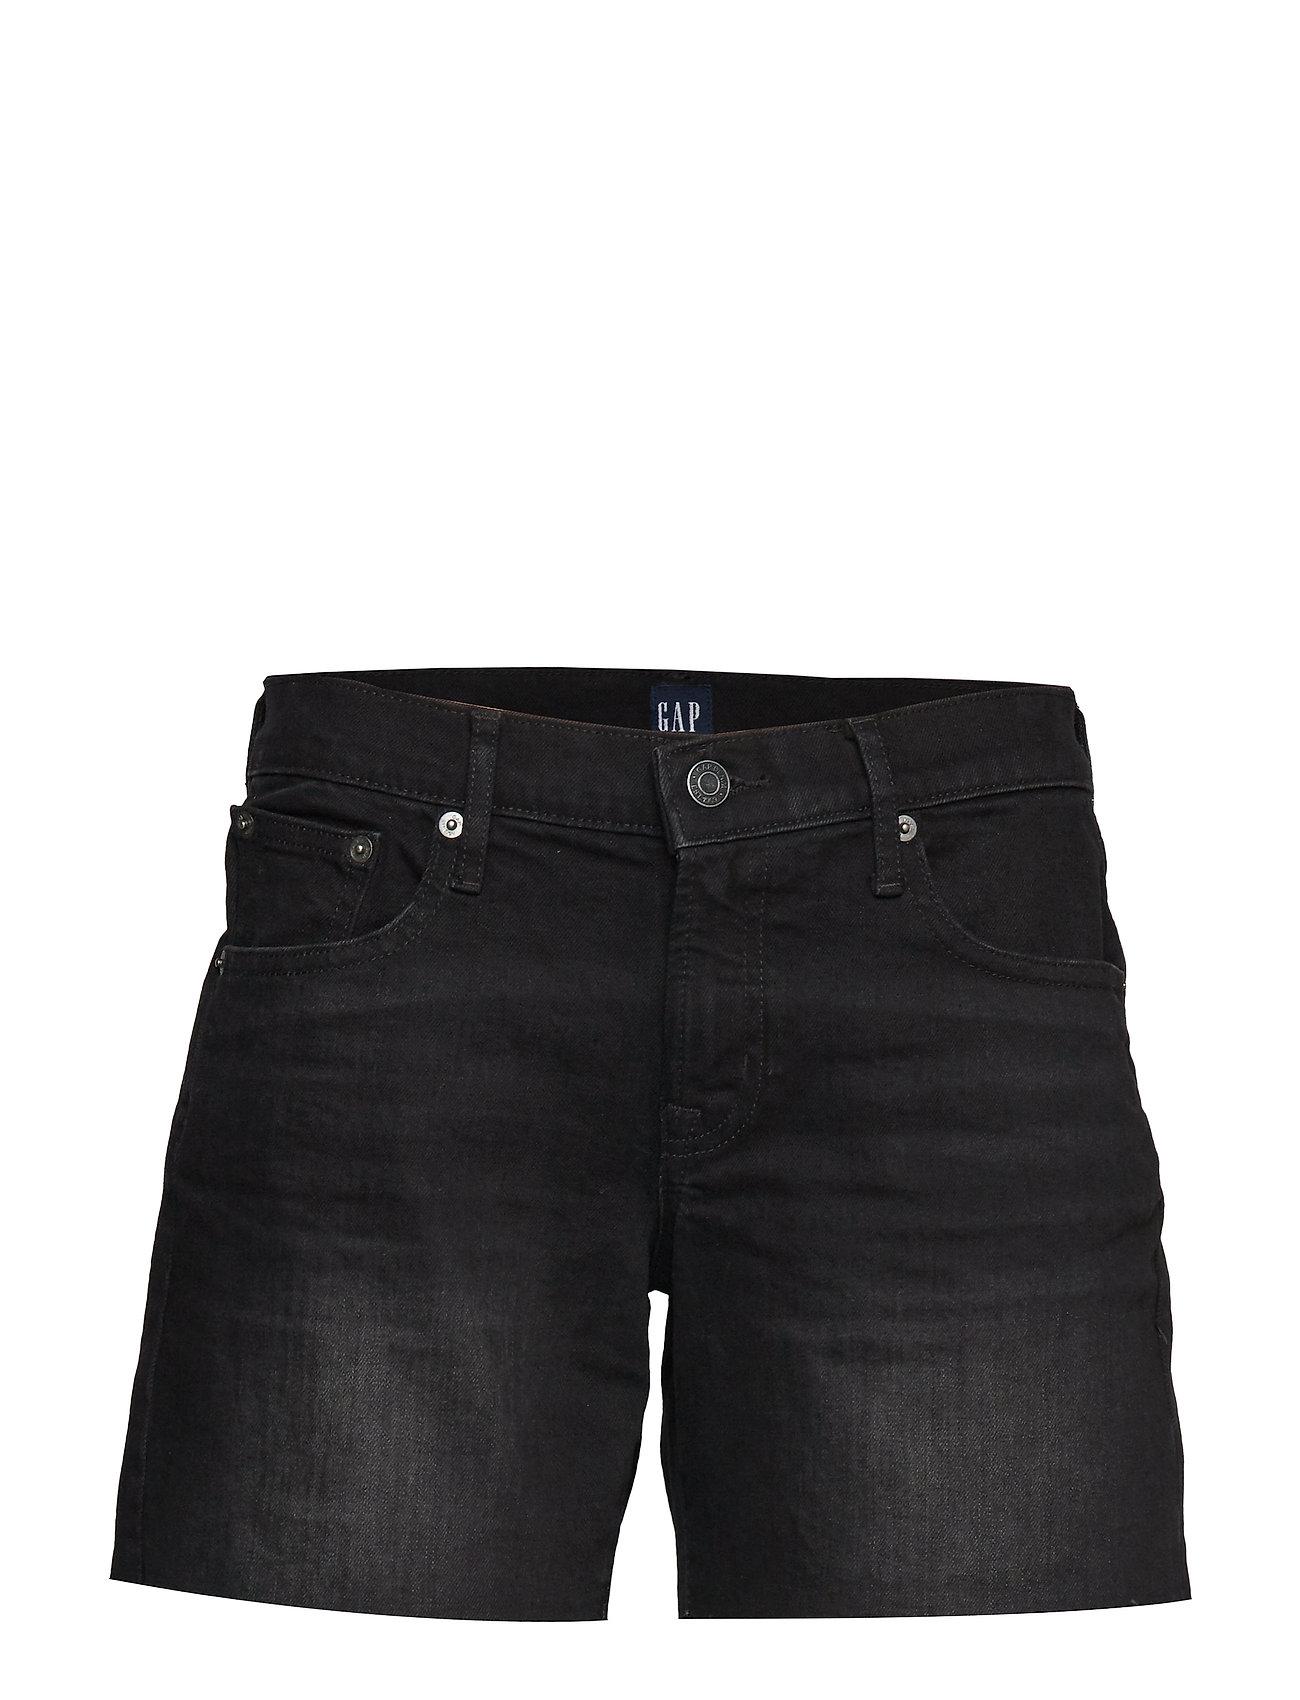 "GAP Mid Rise 5"" Denim Shorts - TRUE BLACK"